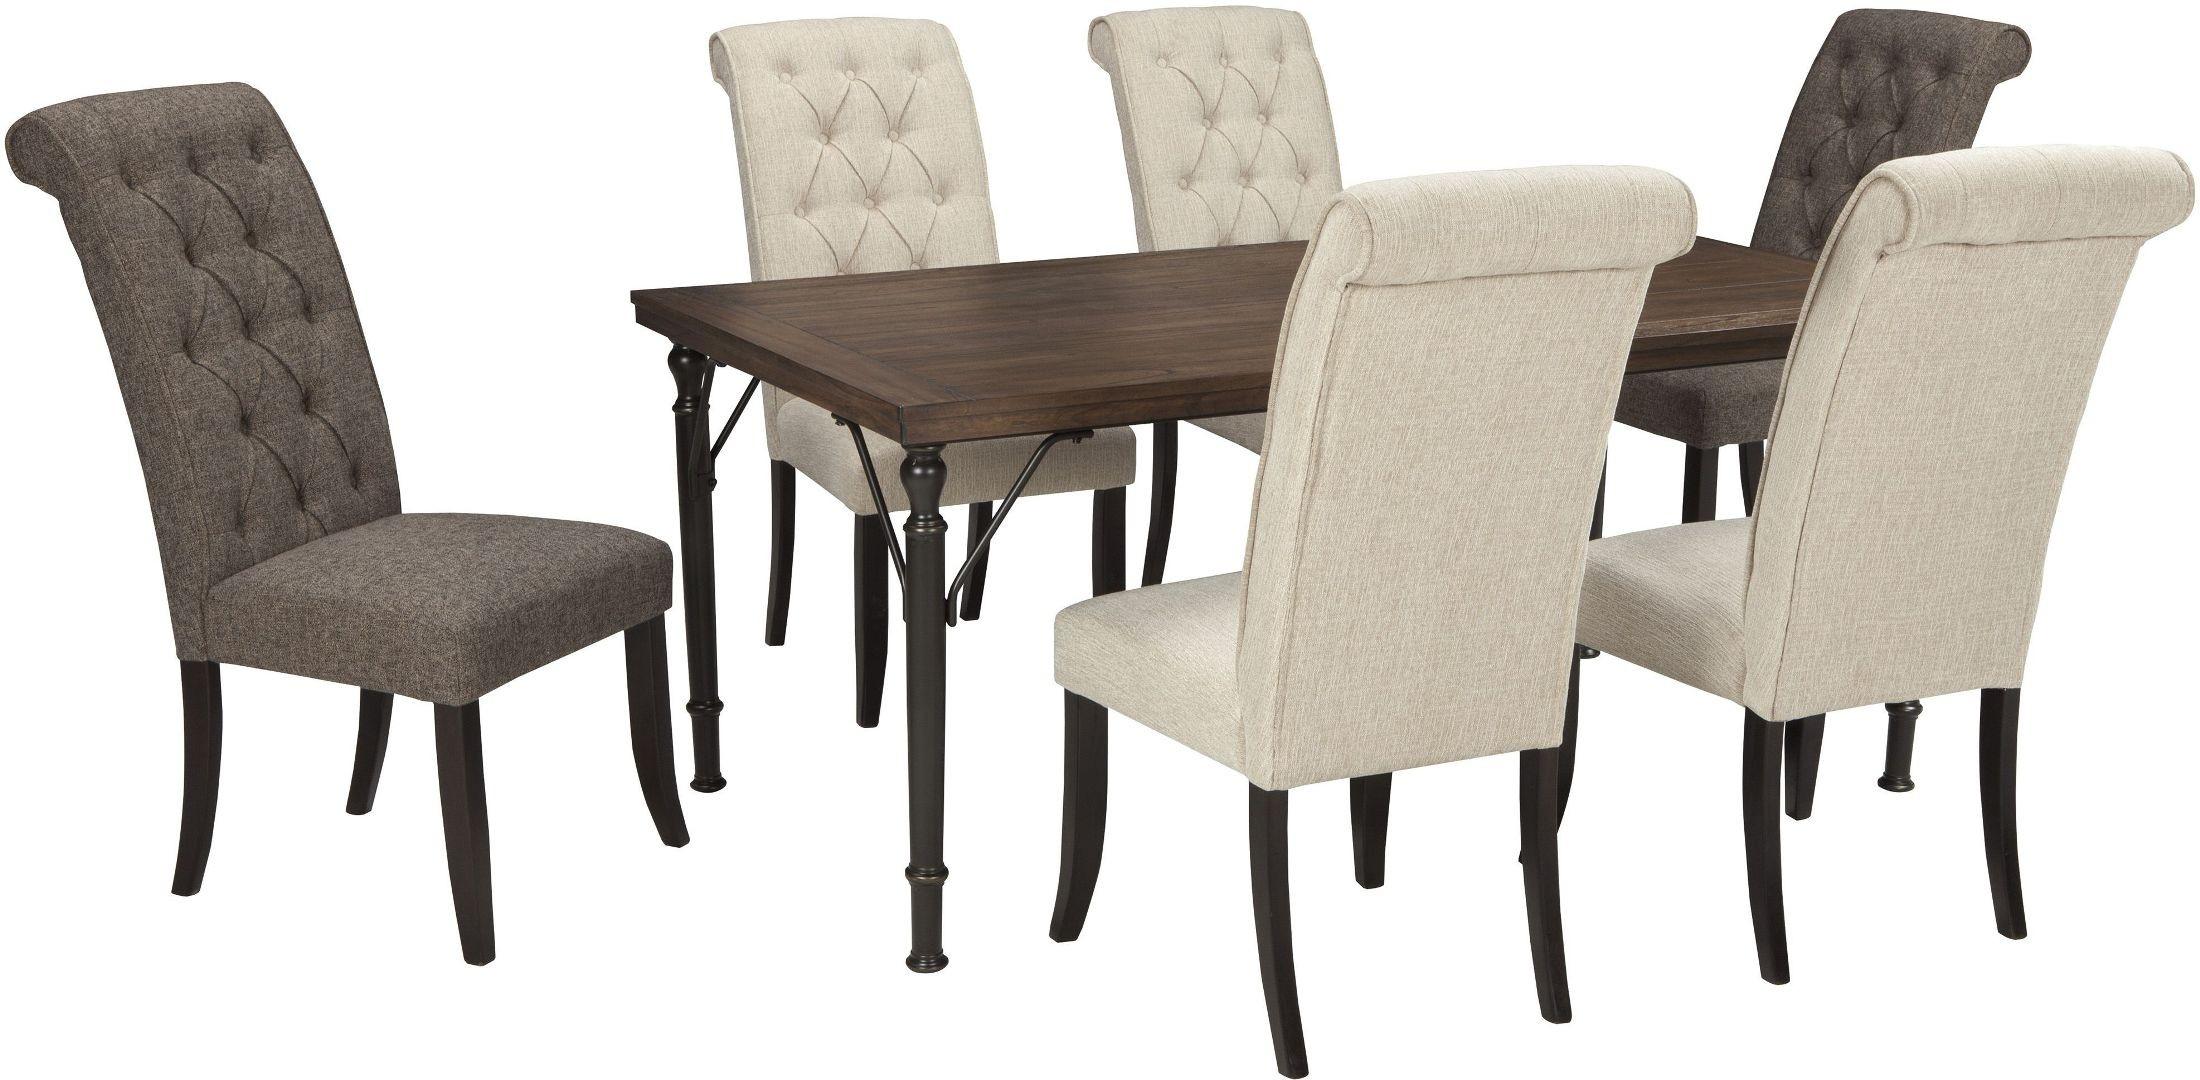 Tripton Rectangular Dining Room Set From Ashley D530 25